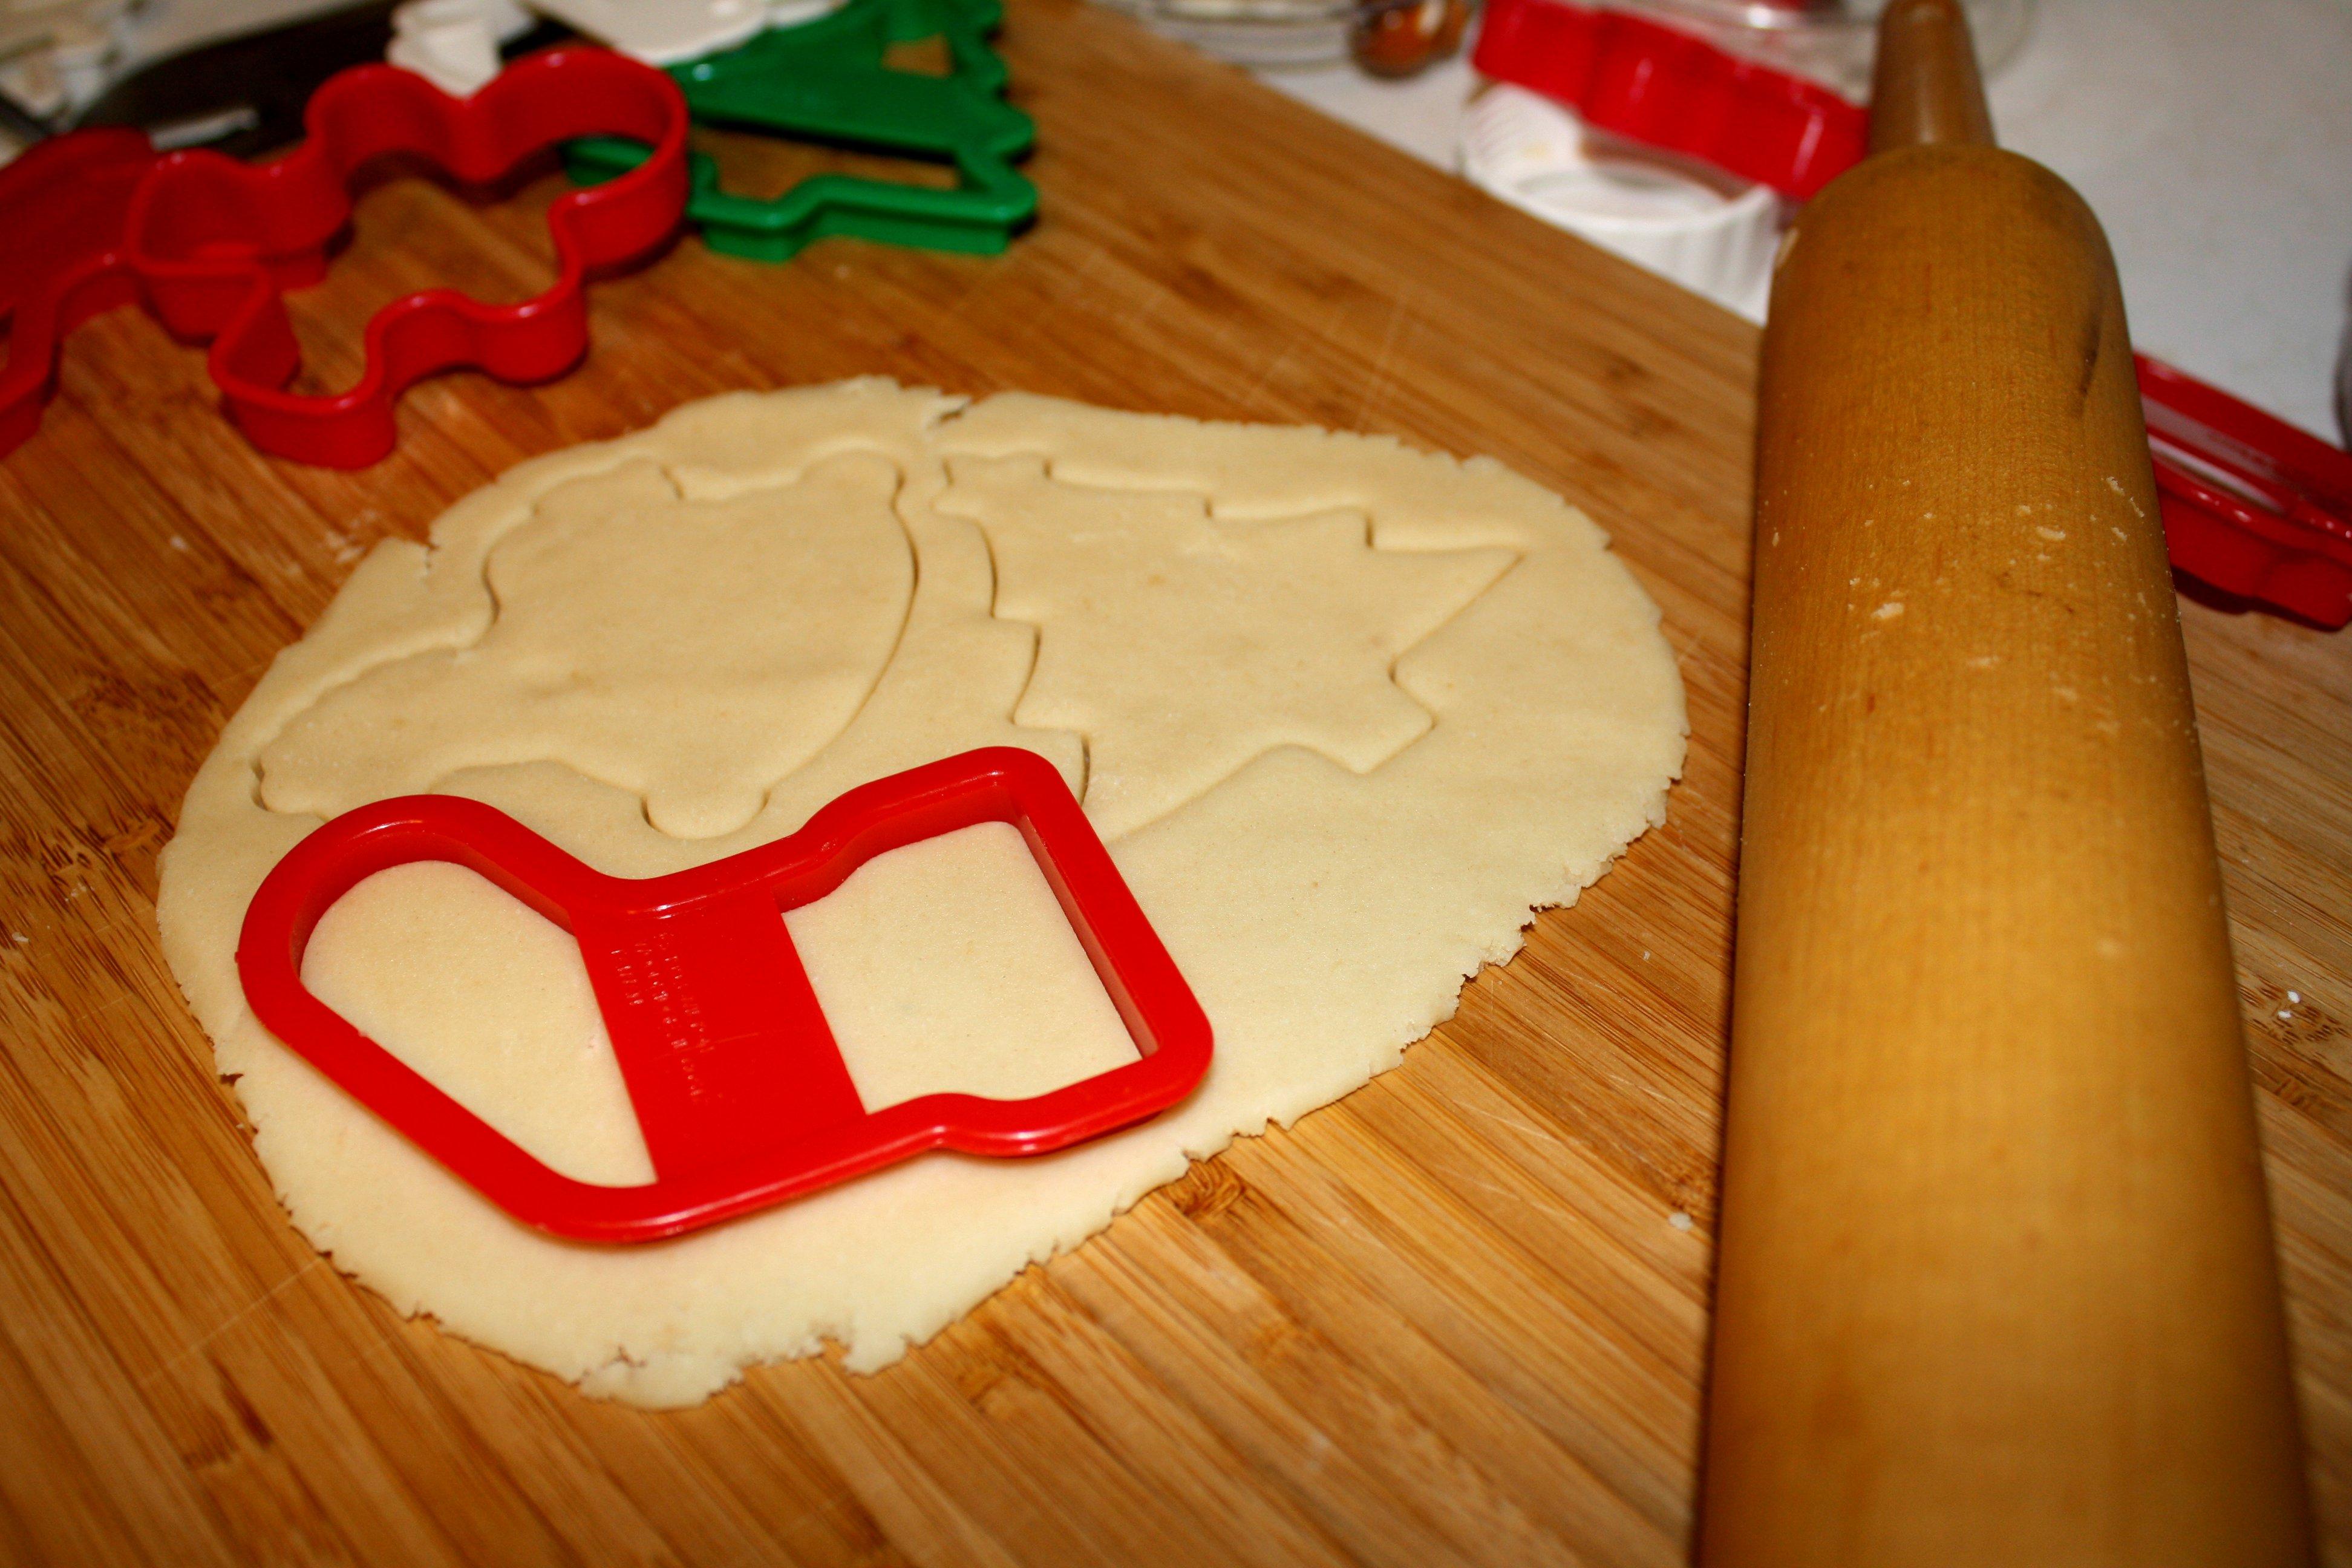 Cookies Pictures | Free Photographs | Photos Public Domain